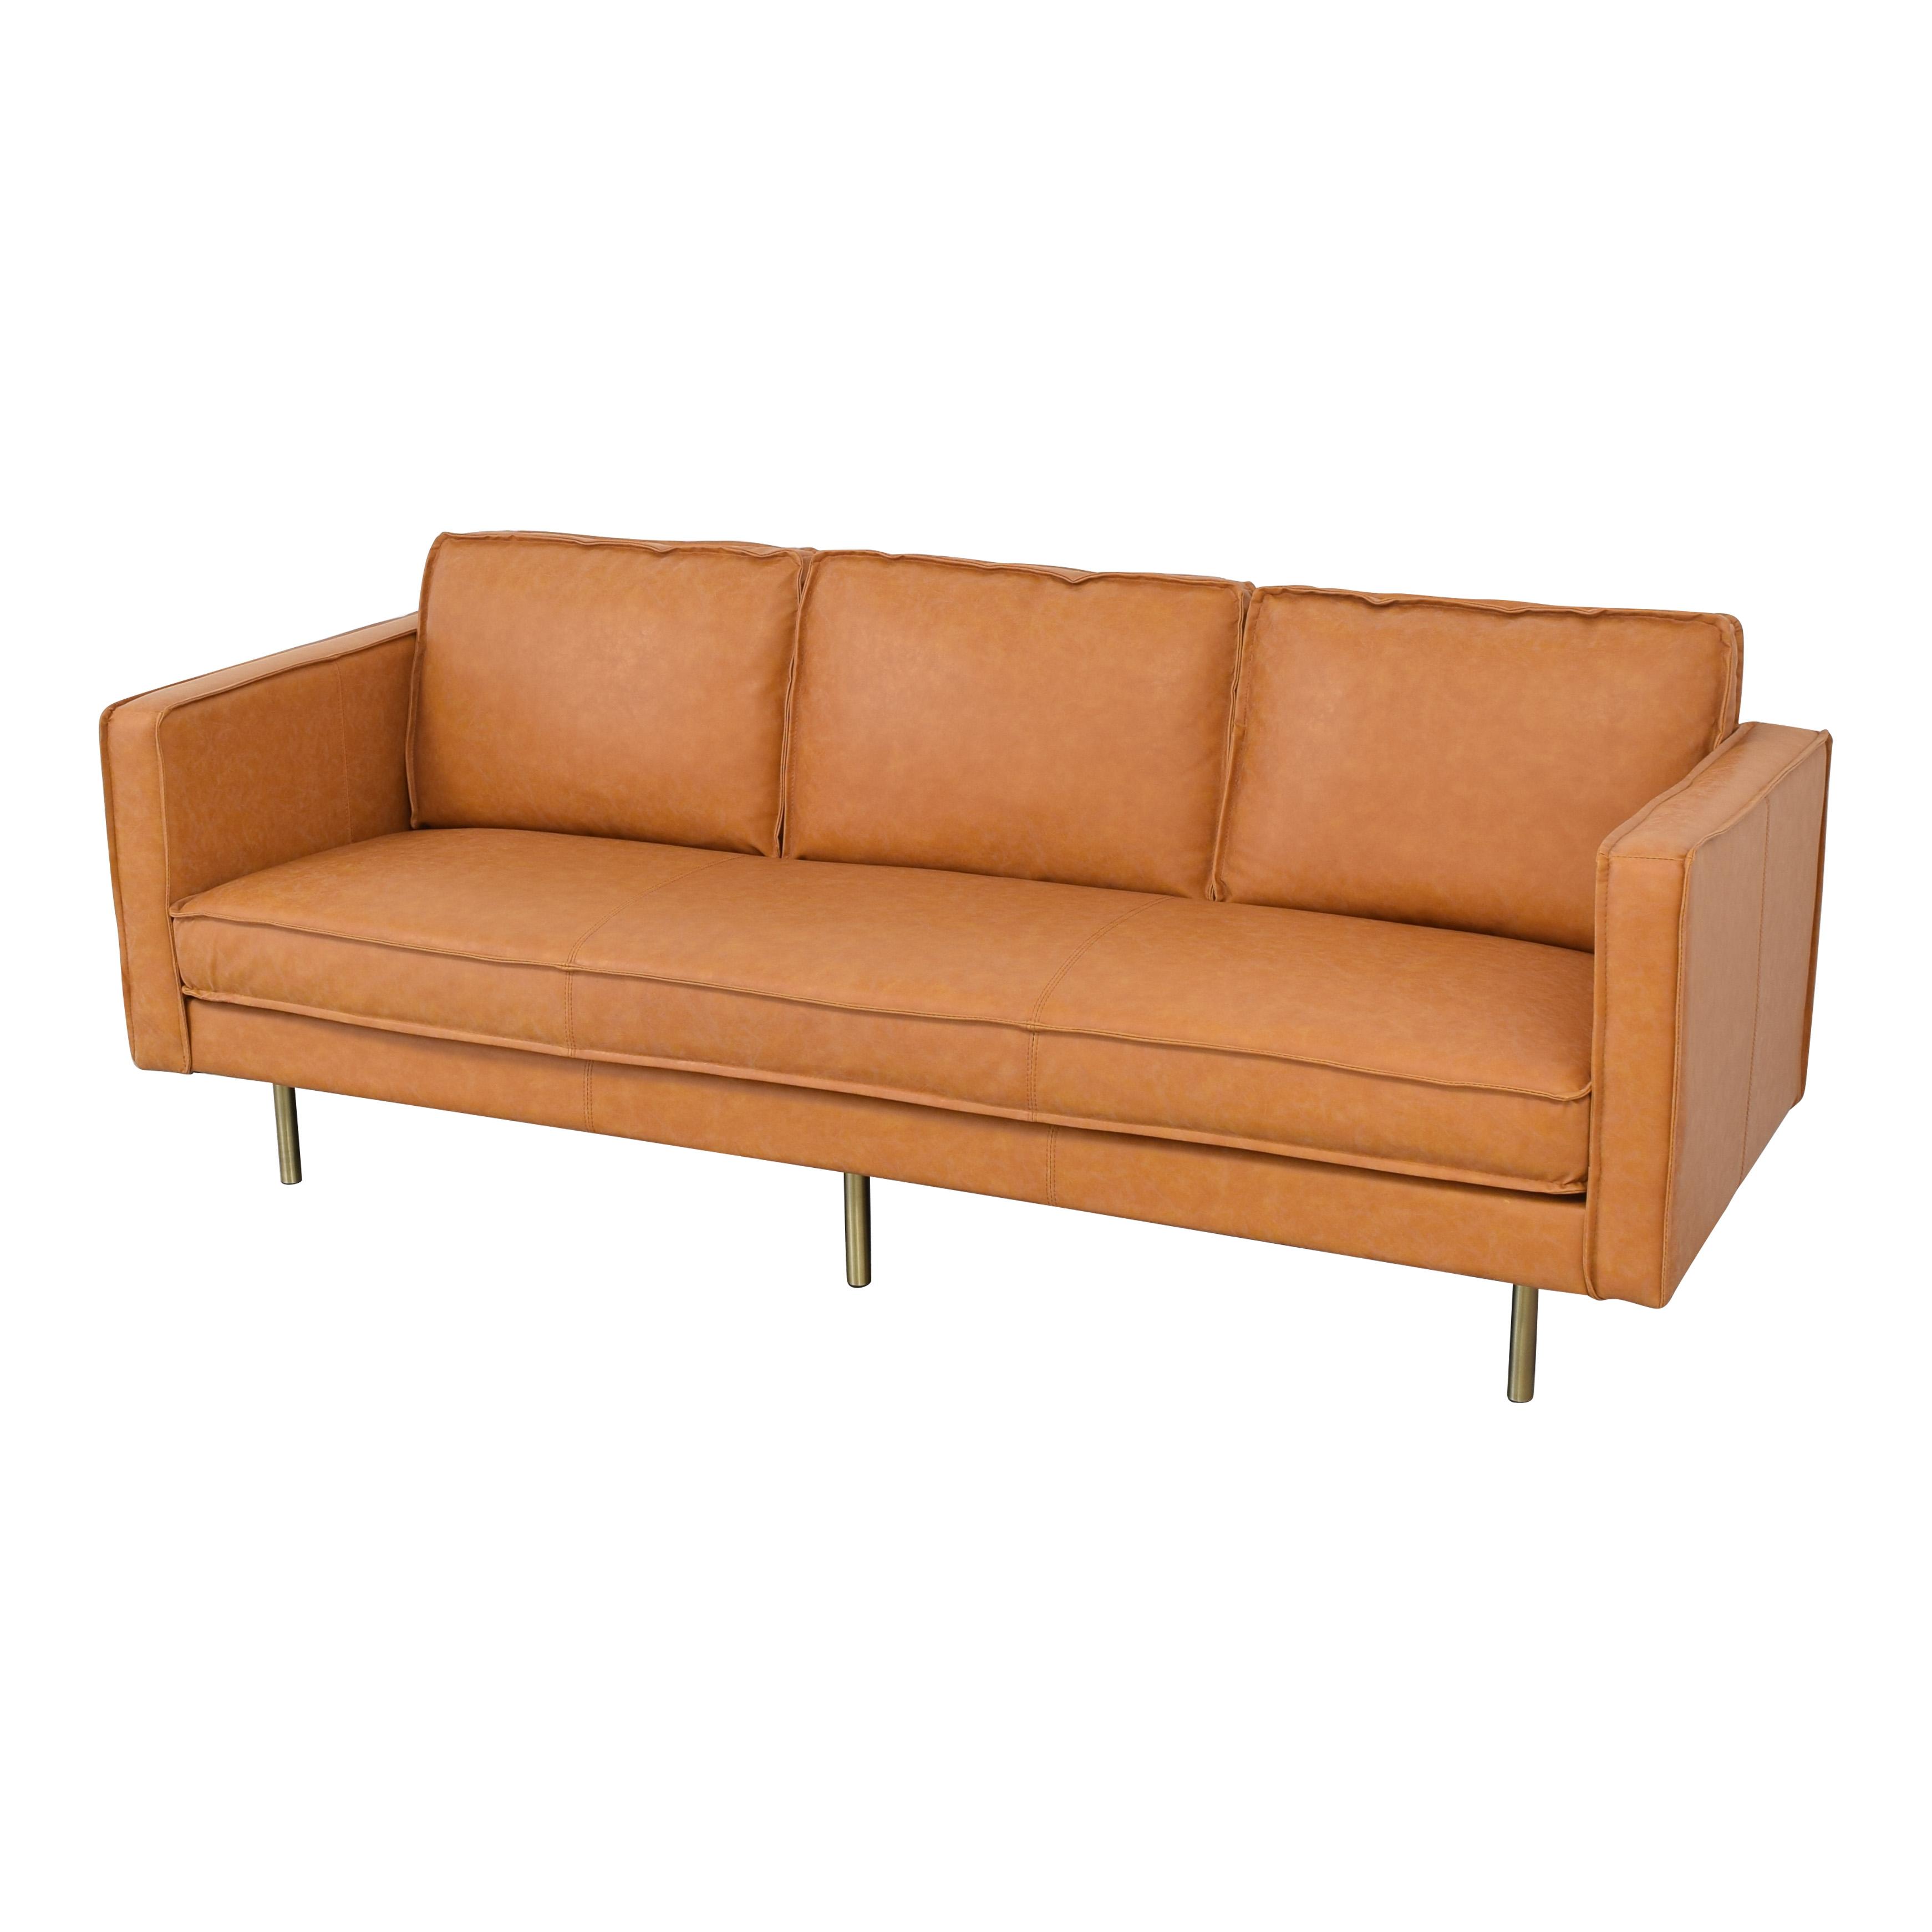 AllModern AllModern Donny Sofa on sale